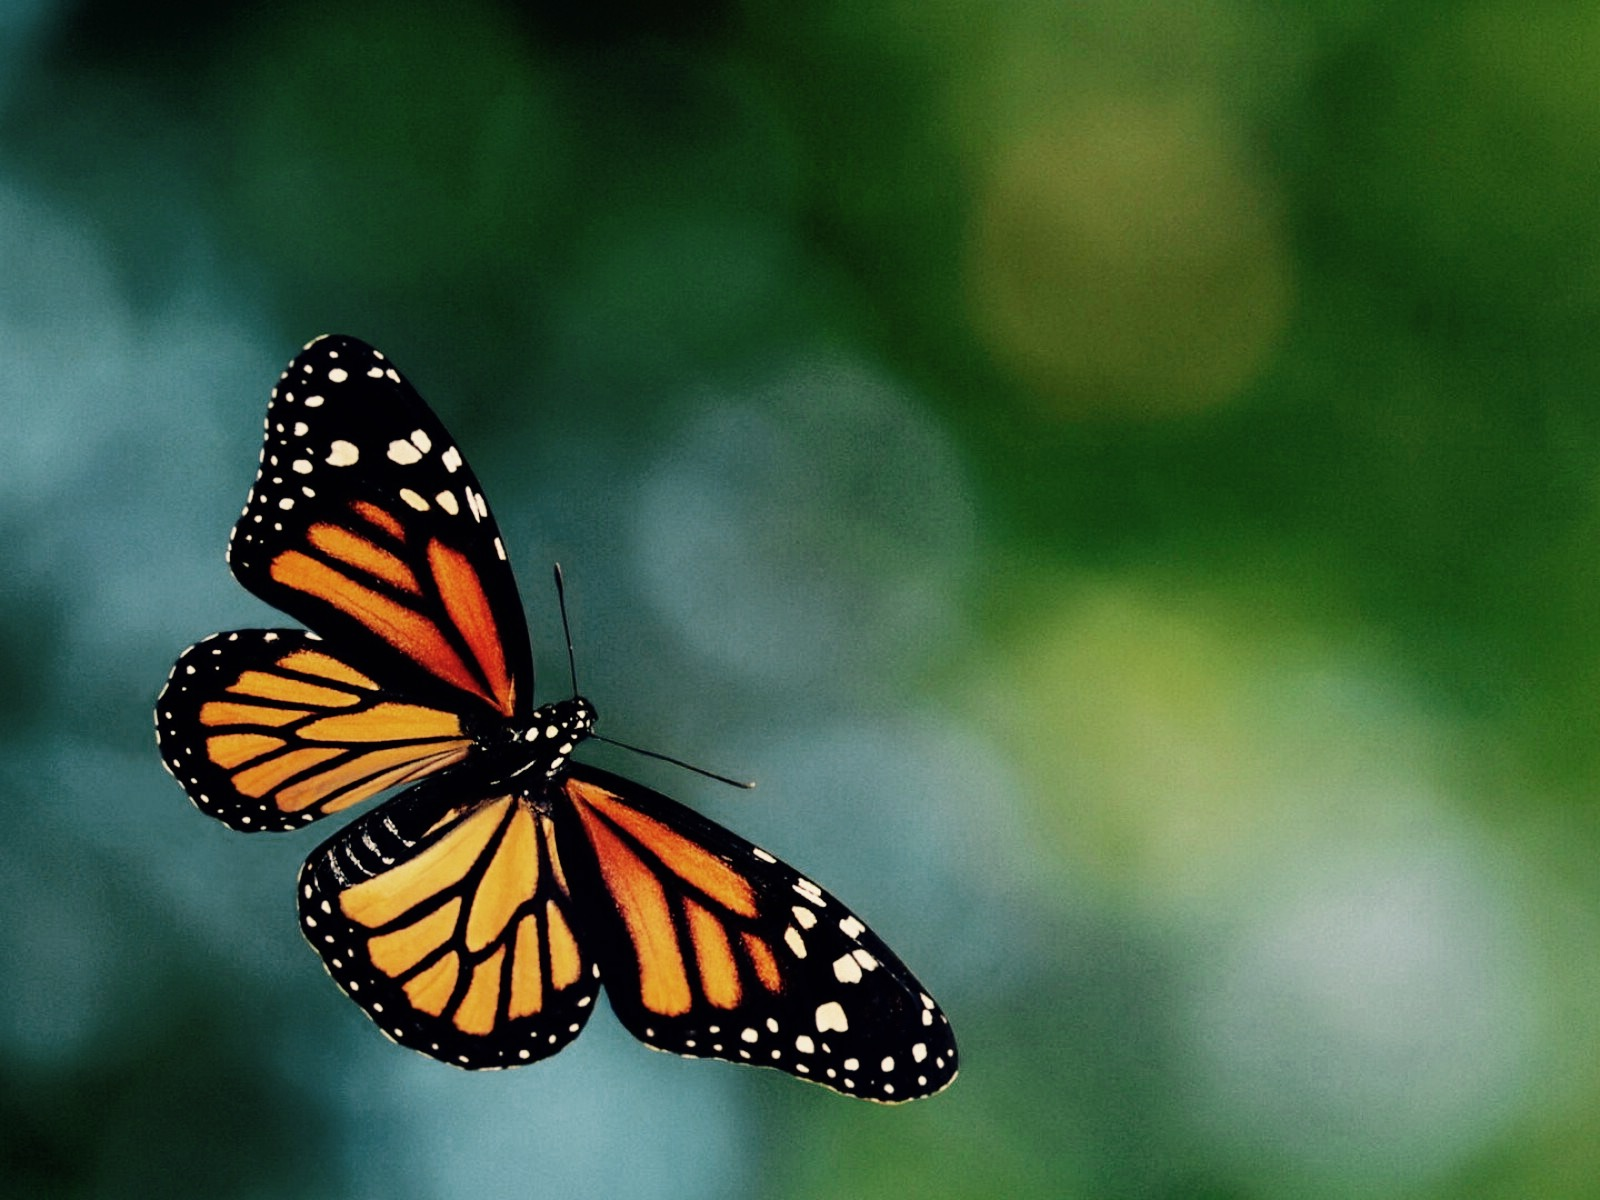 Meme Generator Is This A Butterfly - Malia Lozano